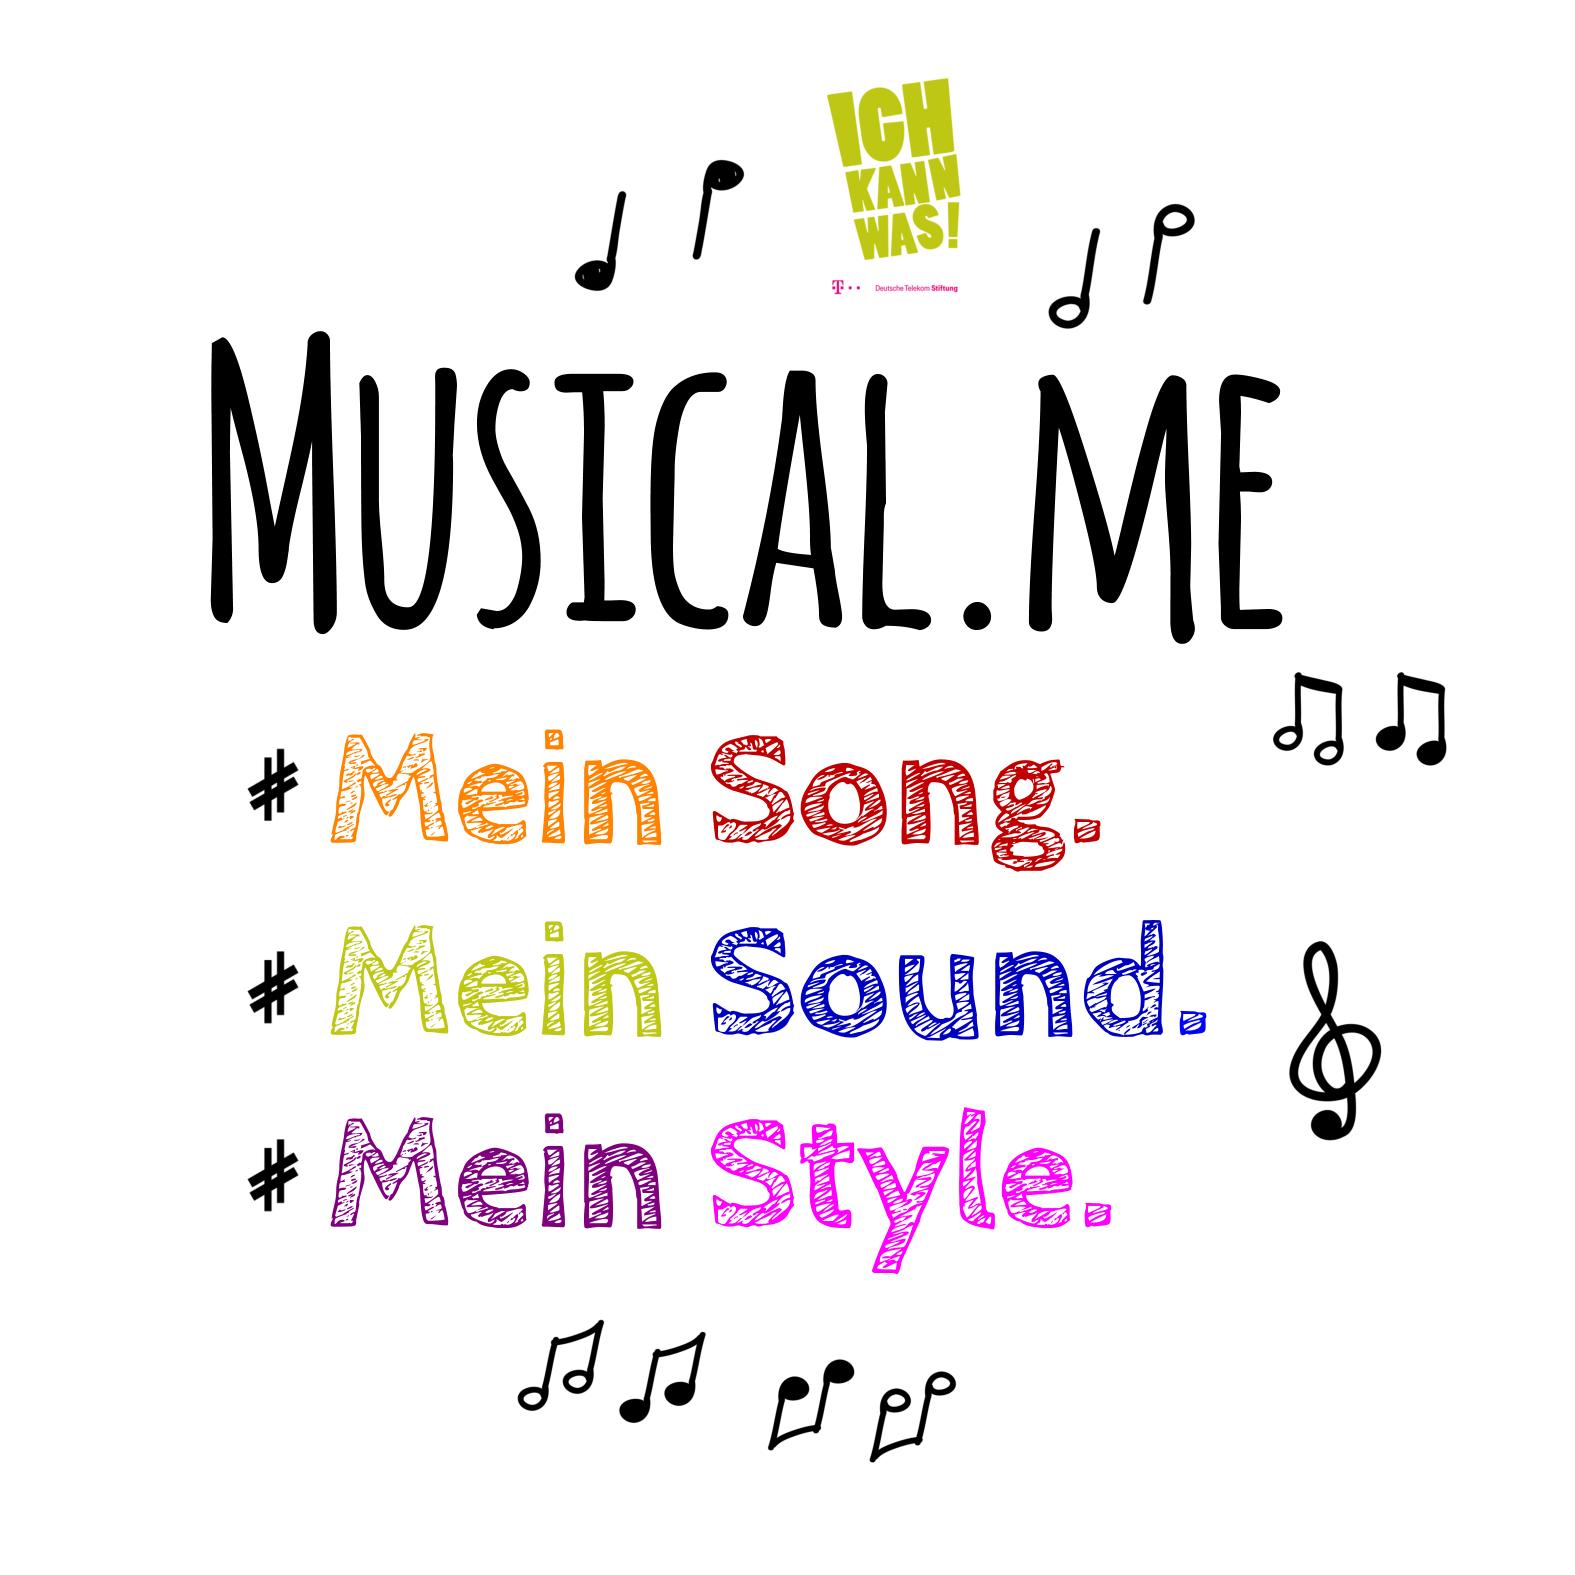 musical.me